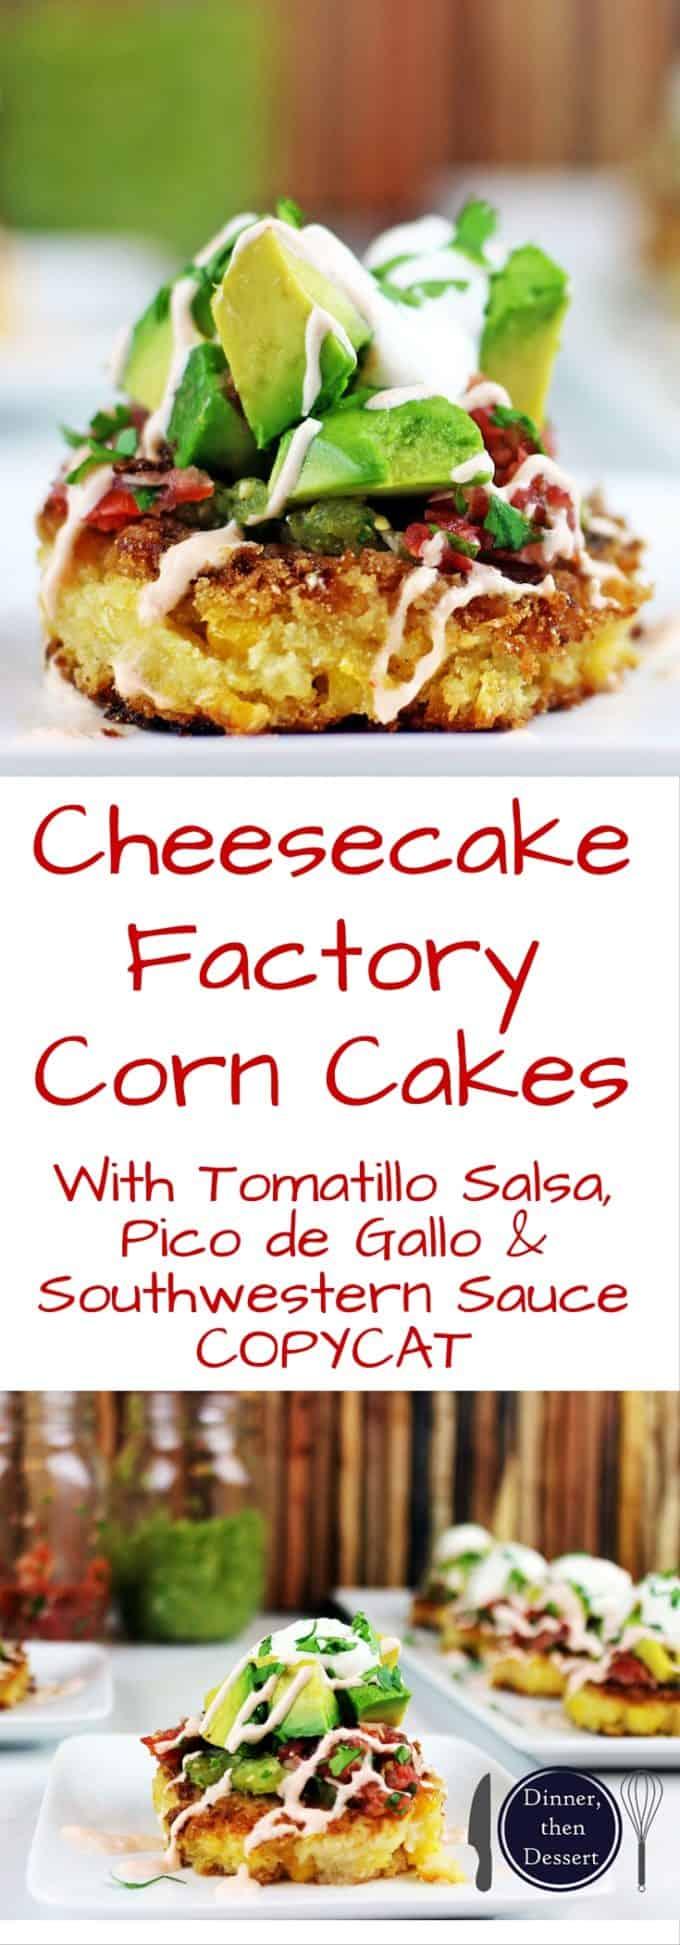 Cheesecake Factory Corn Cakes Calories